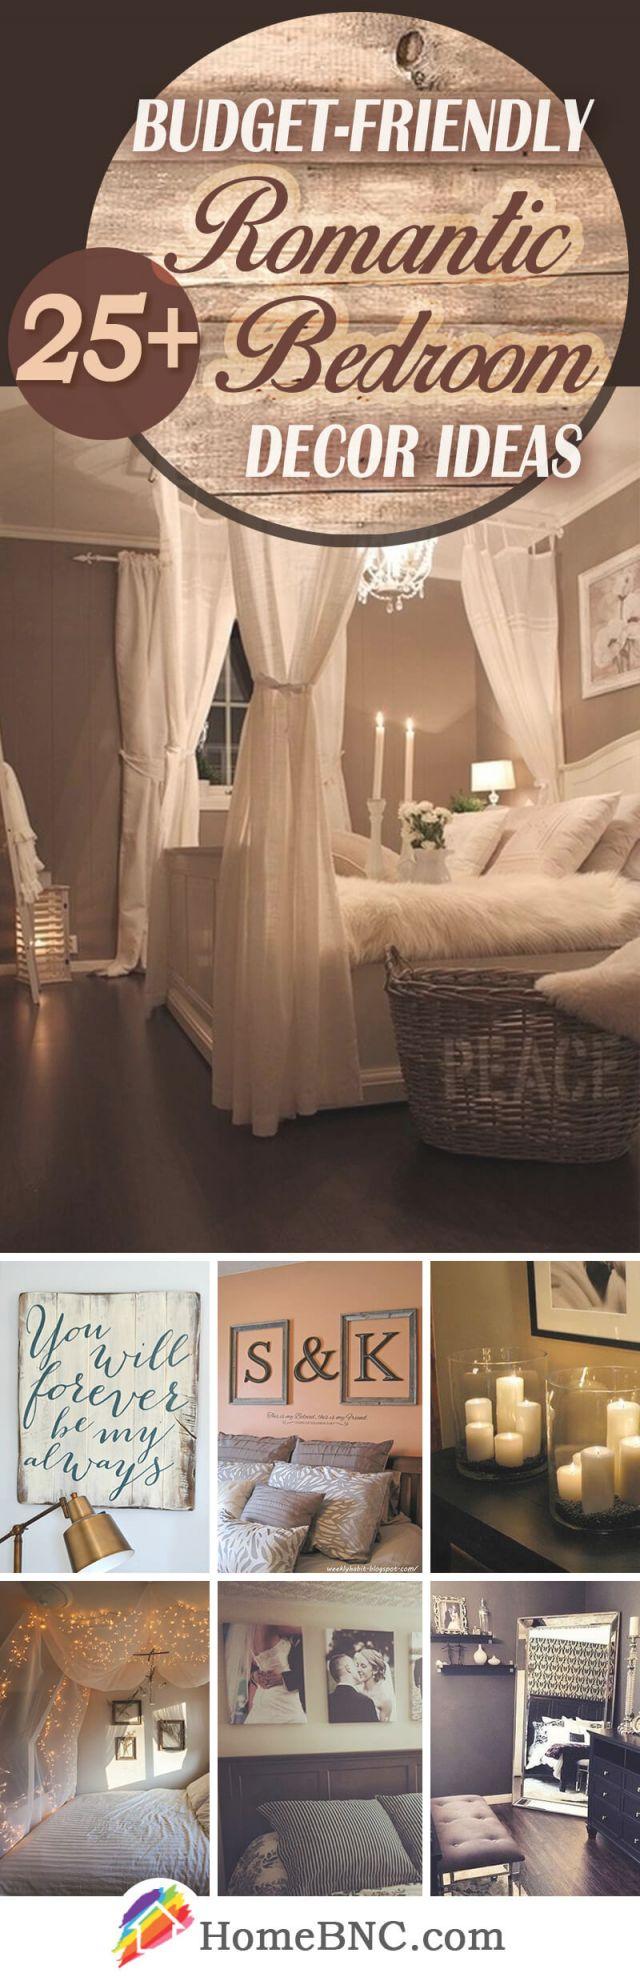 25+ Best Romantic Bedroom Decor Ideas And Designs For 2020 pertaining to Romantic Bedroom Decorating Ideas Pinterest